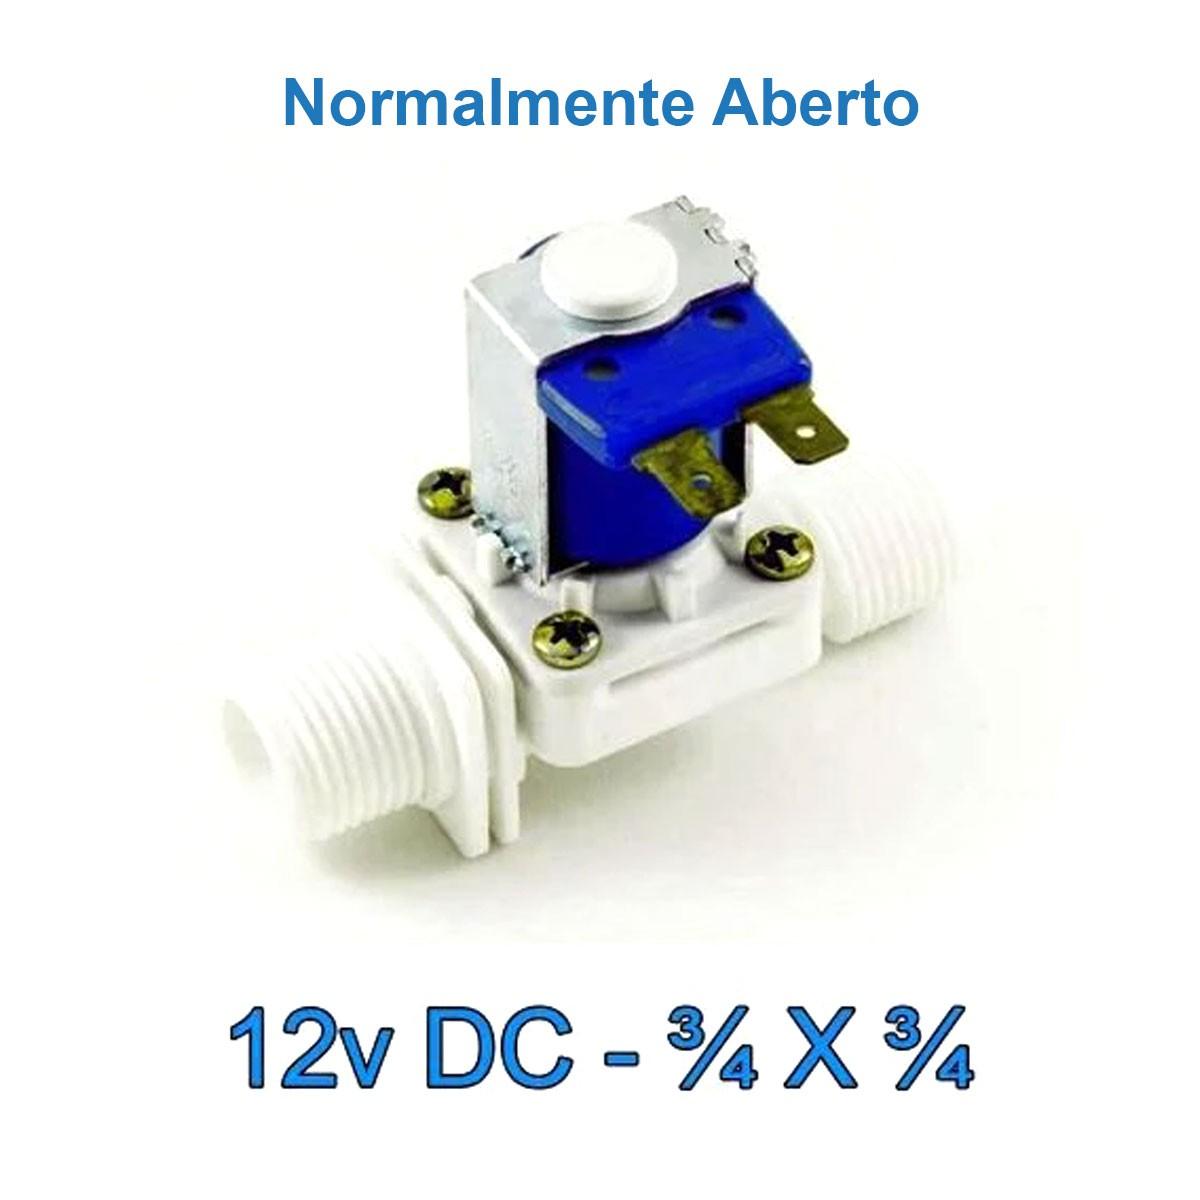 Válvula Solenoide Normalmente Aberta 12v DC 180° (3/4 X 3/4) VA 04